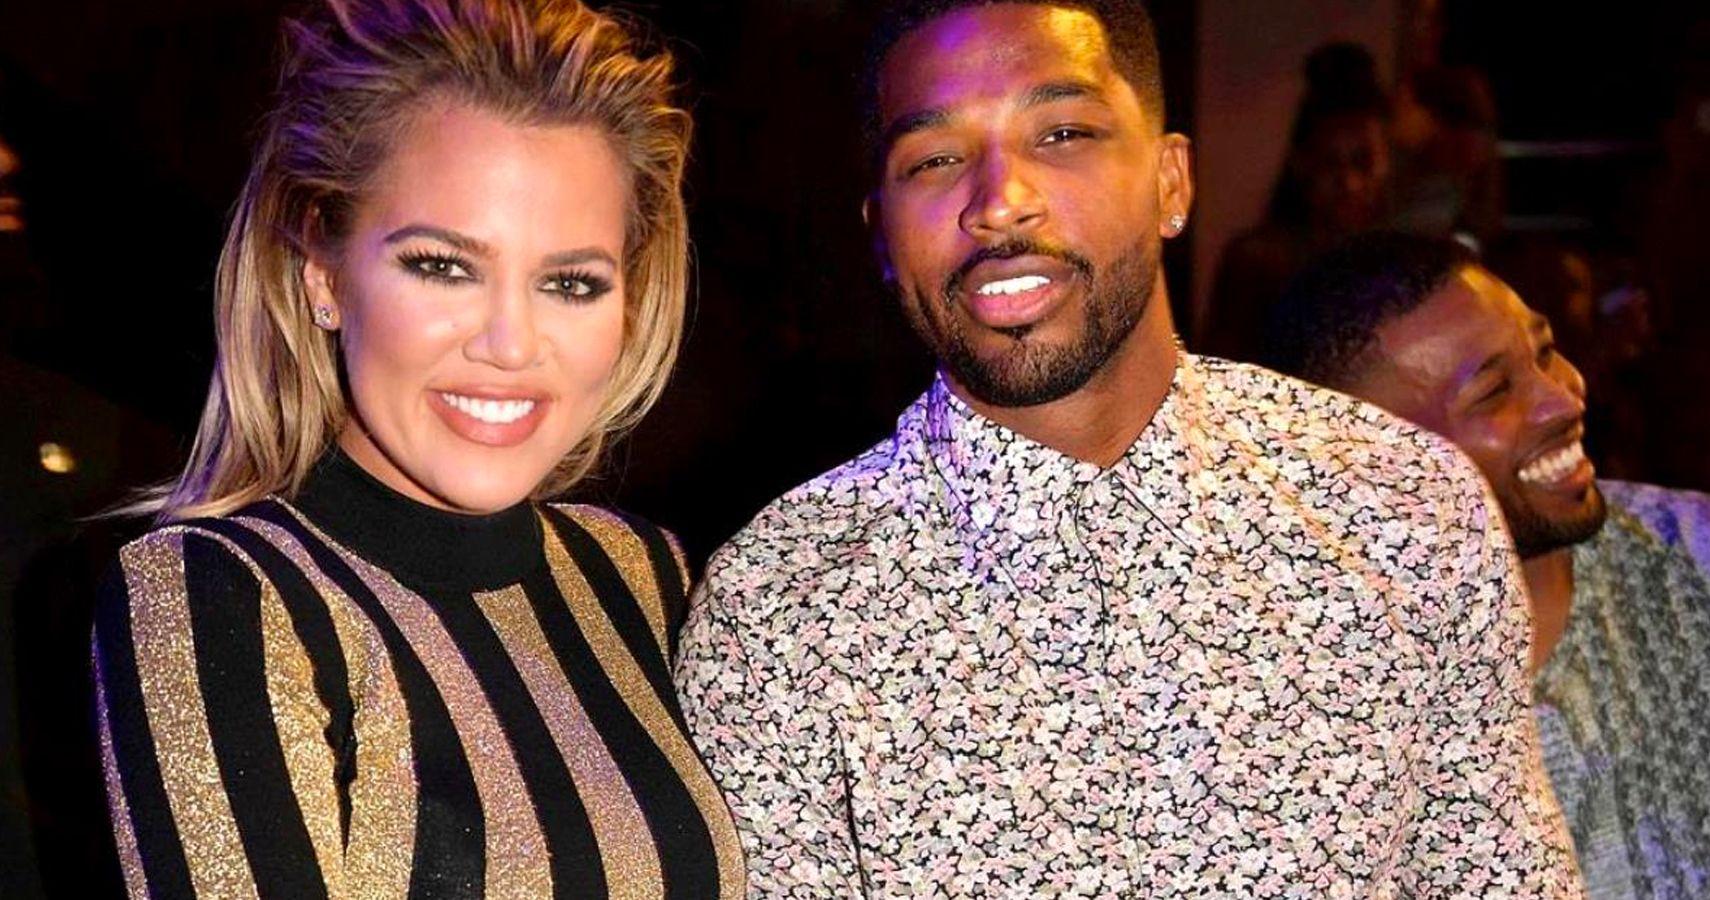 Khloè Kardashian and Tristan Thompson Relationship Update